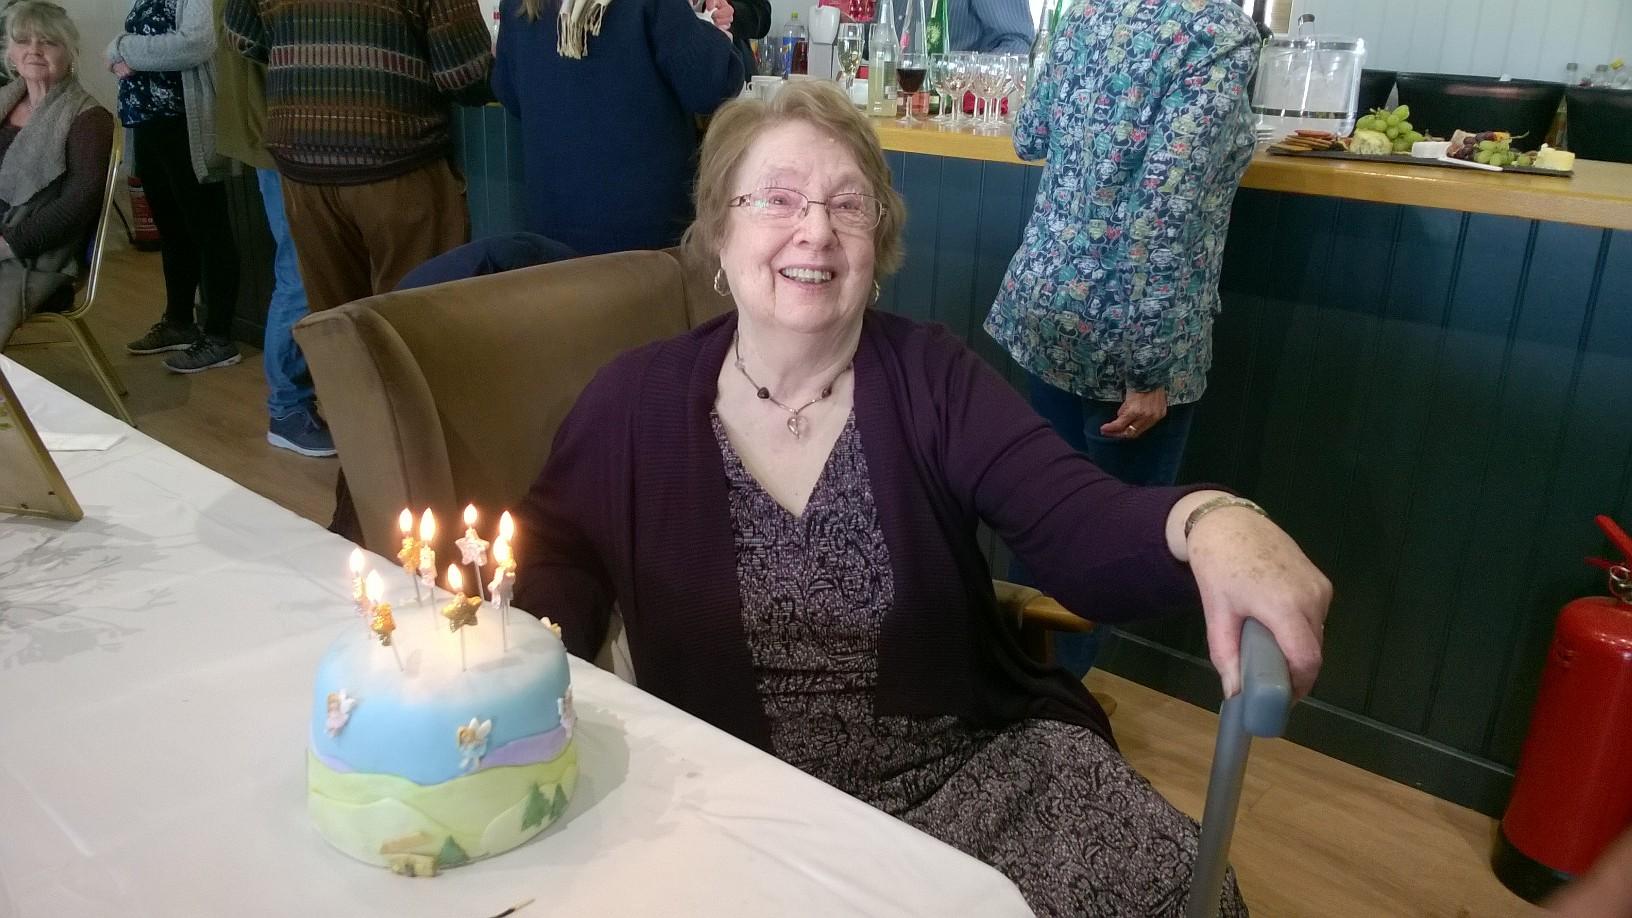 Jean celebrating her 80th Birthday